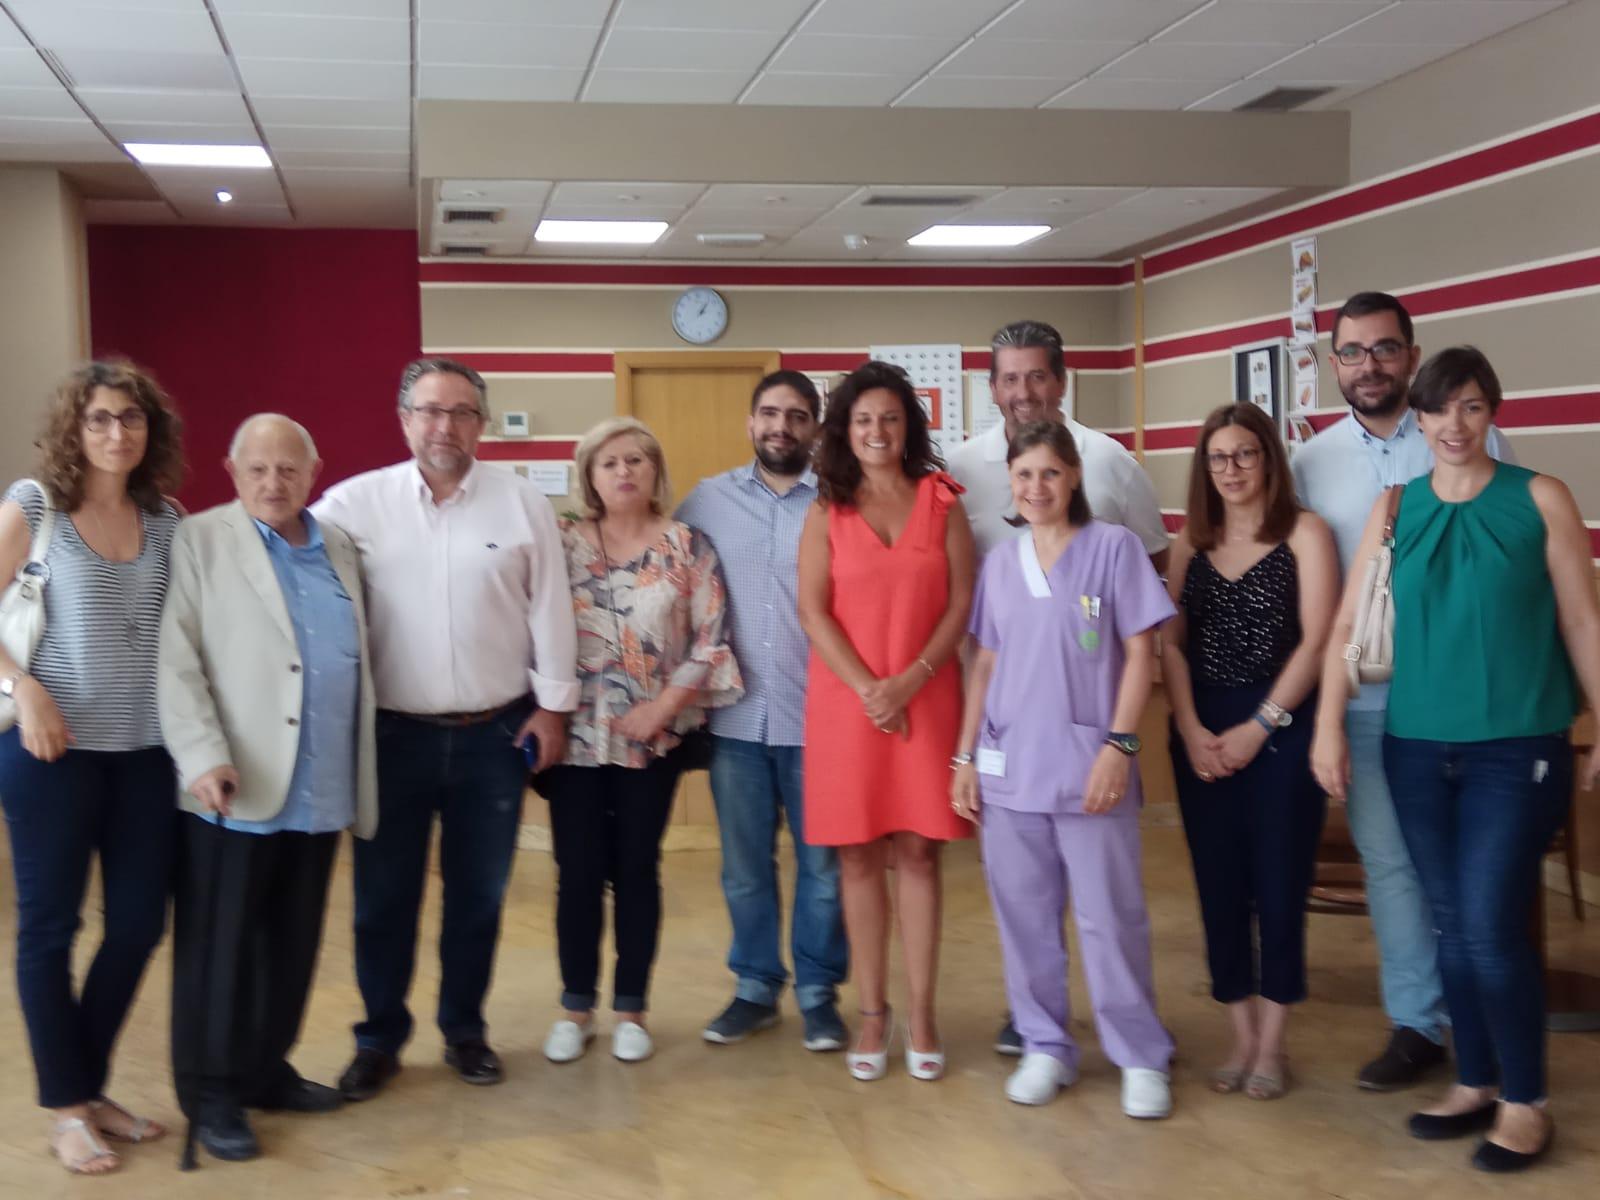 DomusVi Valdemoro. Aniversario. Visita corporación municipal (5)